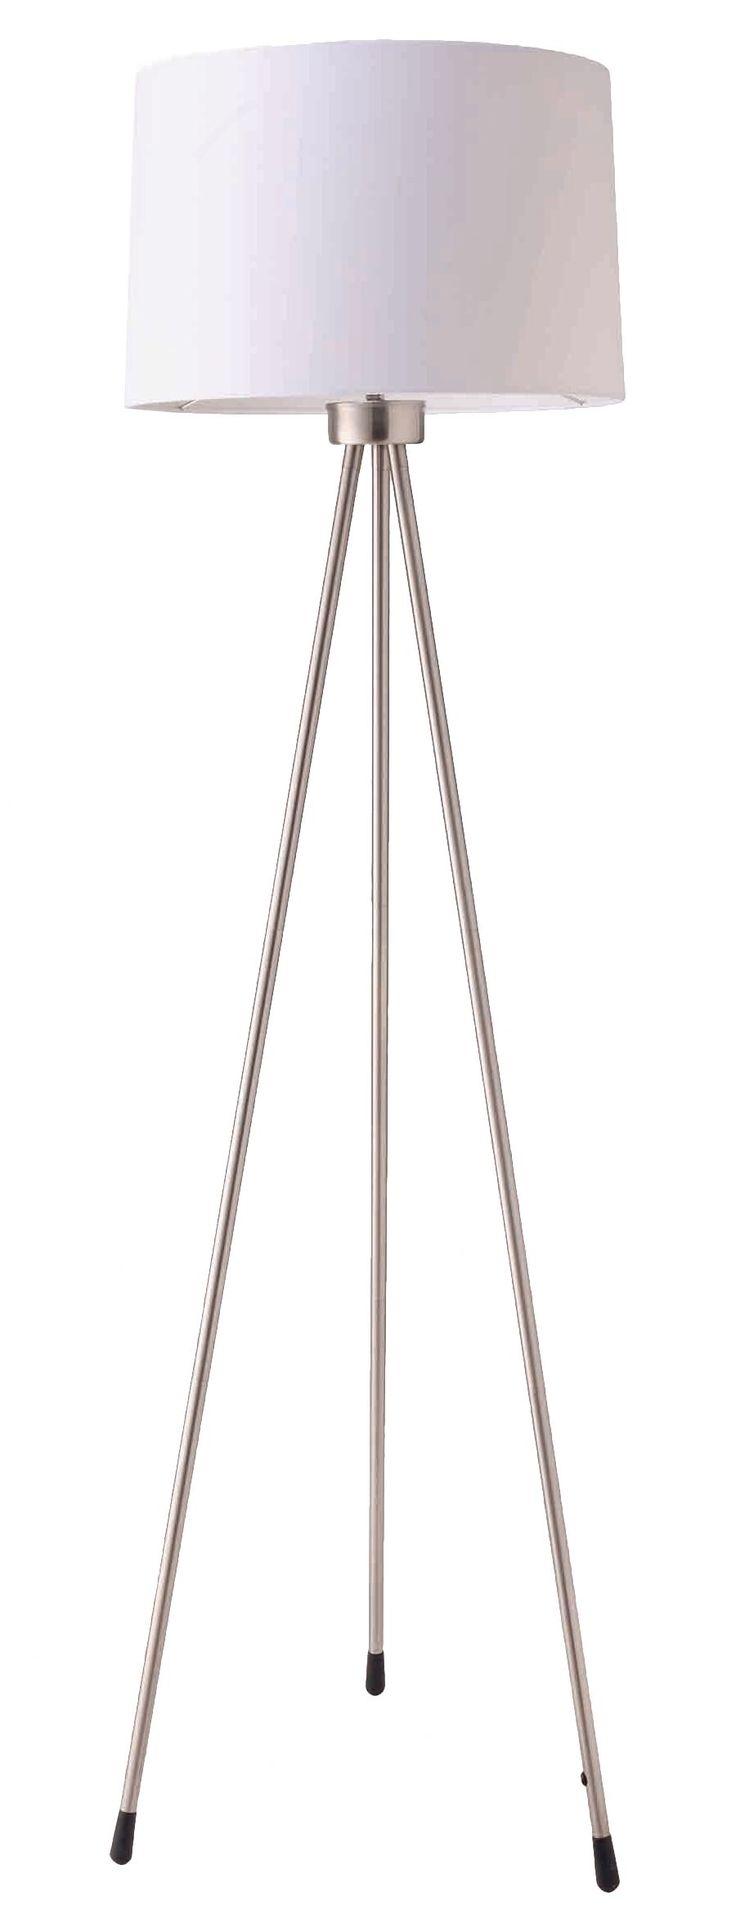 legged 59 floor lamp living room pinterest floor lamps chang. Black Bedroom Furniture Sets. Home Design Ideas